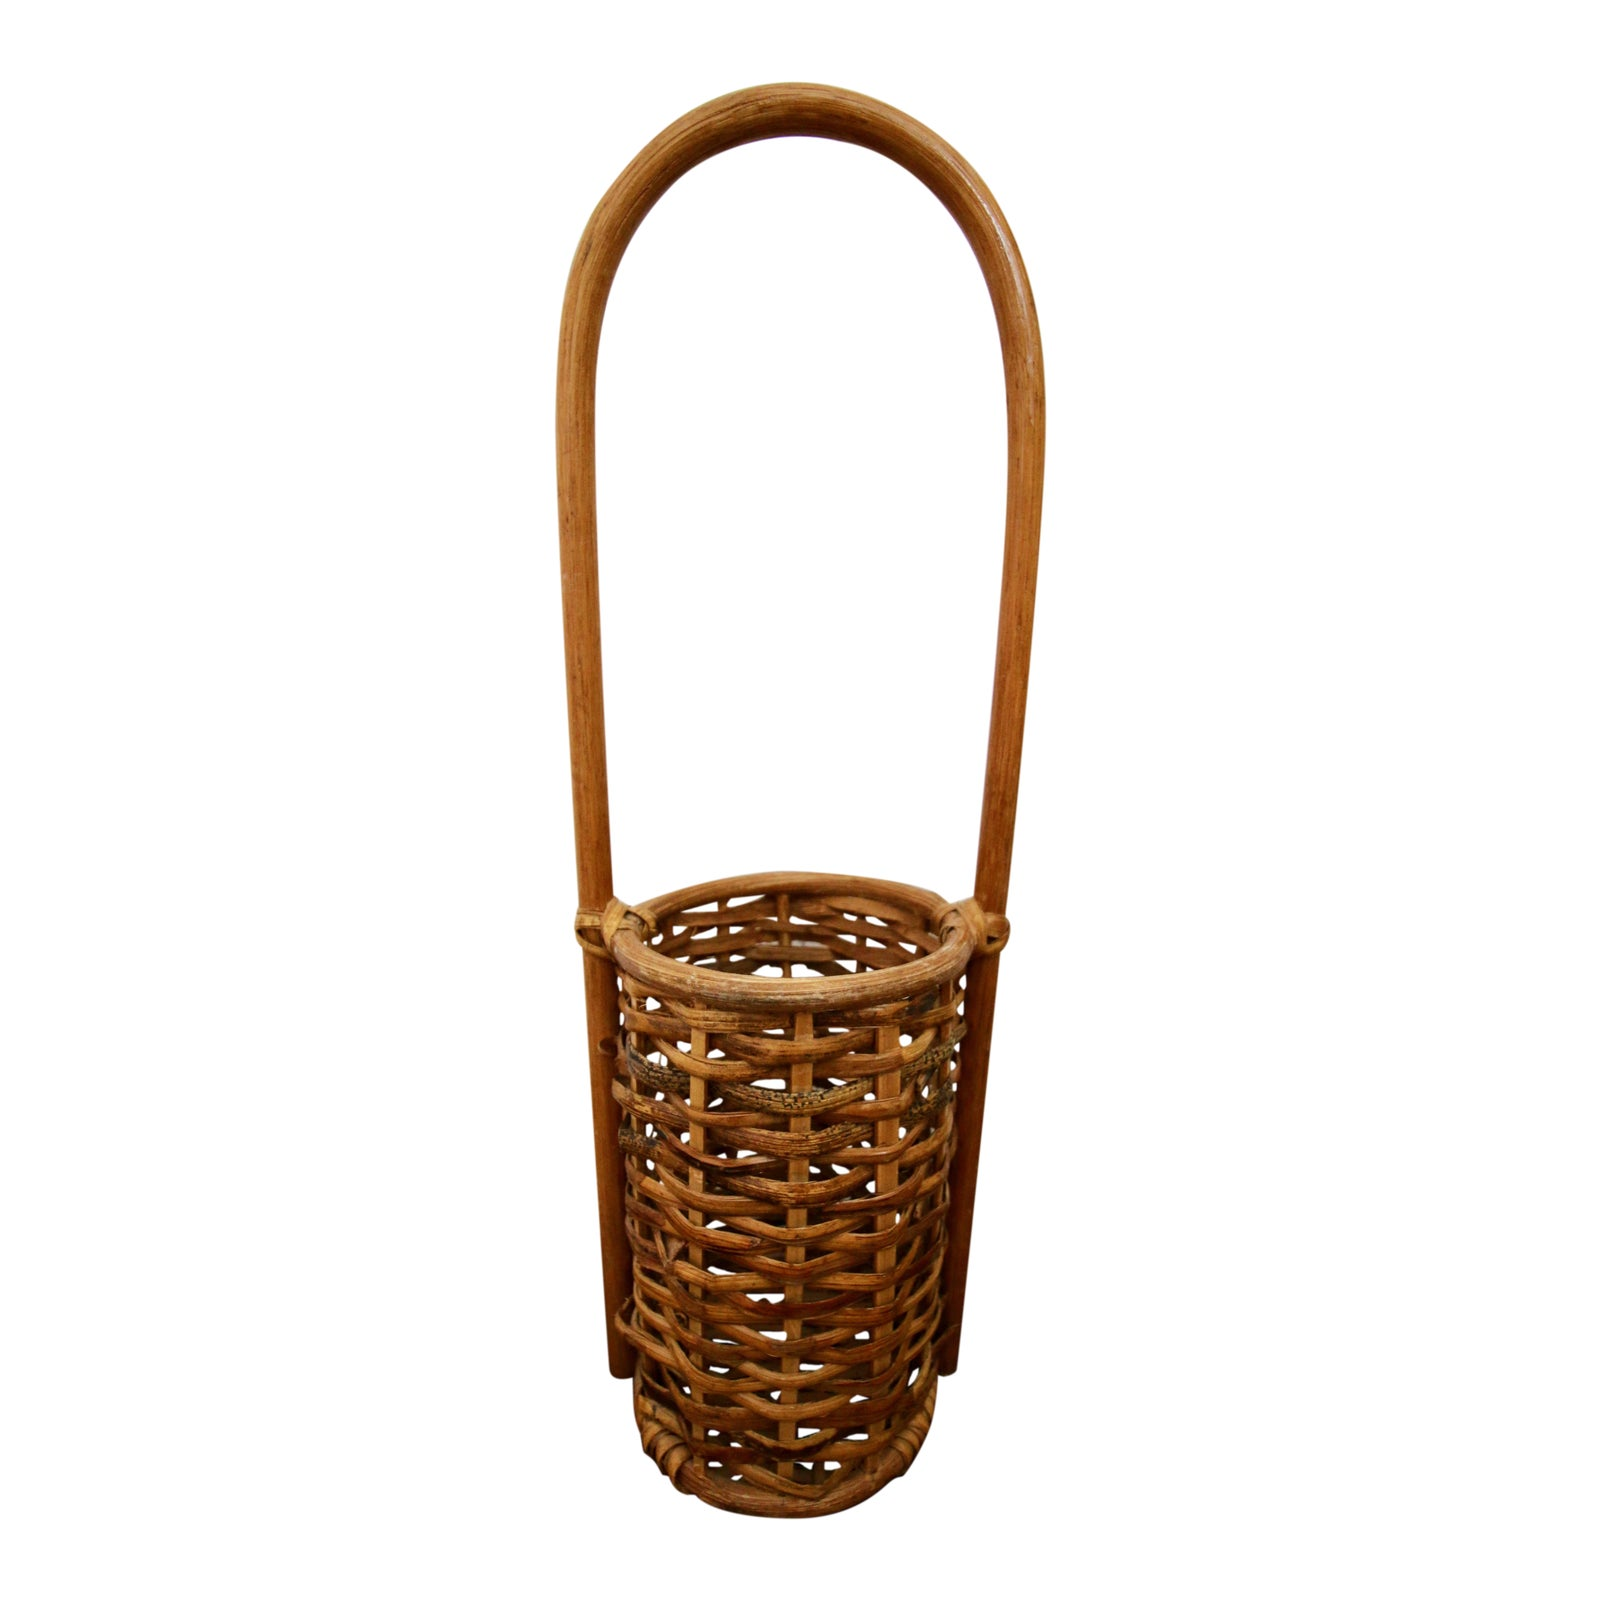 Bamboo Rattan Wine Bottle Holder Caddy Basket | Chairish